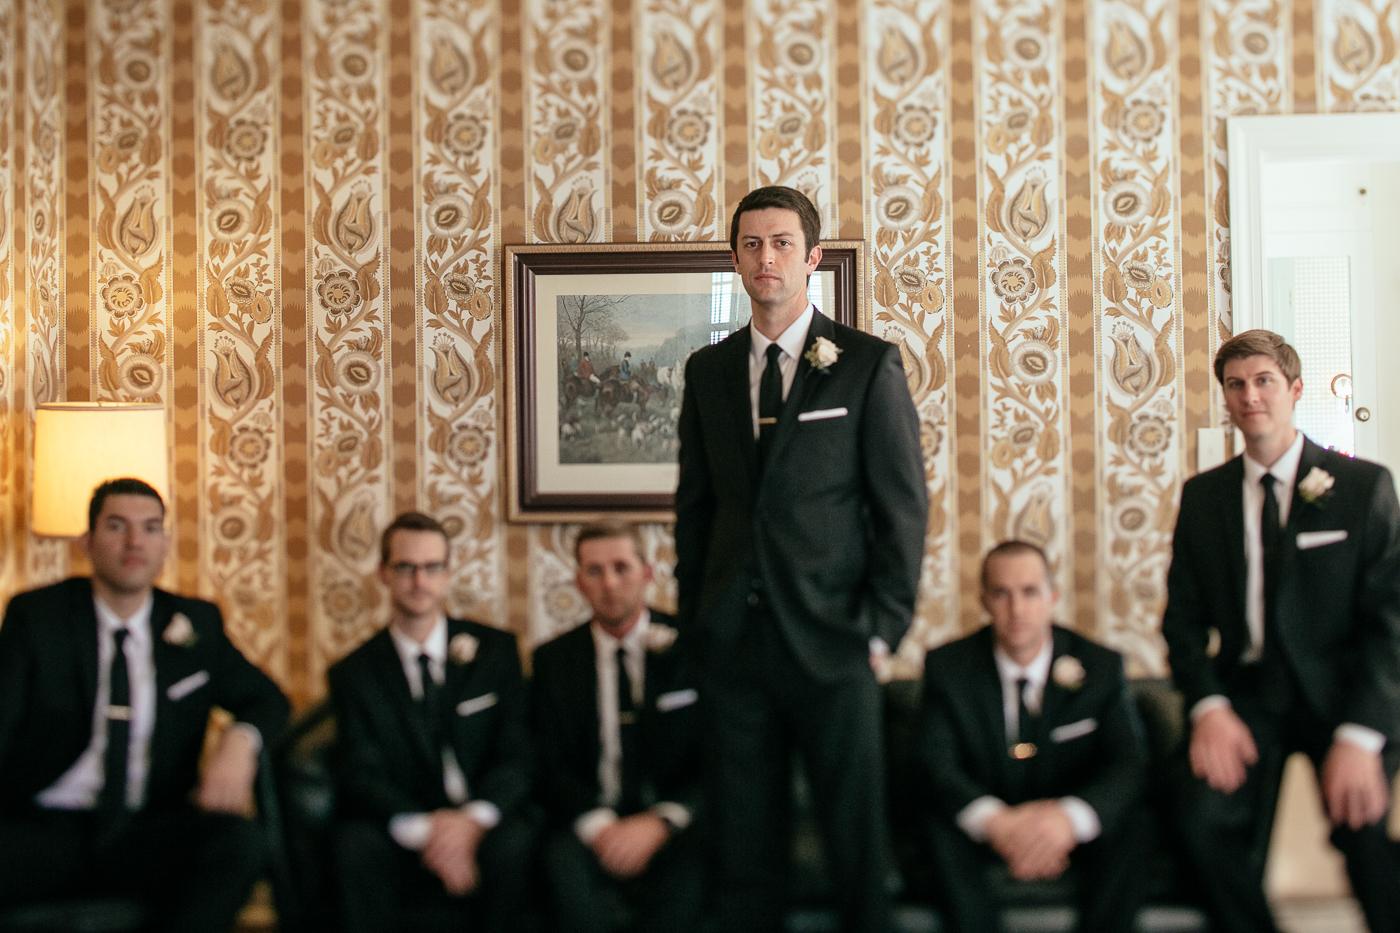 RYAN_&_KELLEY_DARLINGTON_HOUSE_WEDDING_2014_7X9A1805.JPG